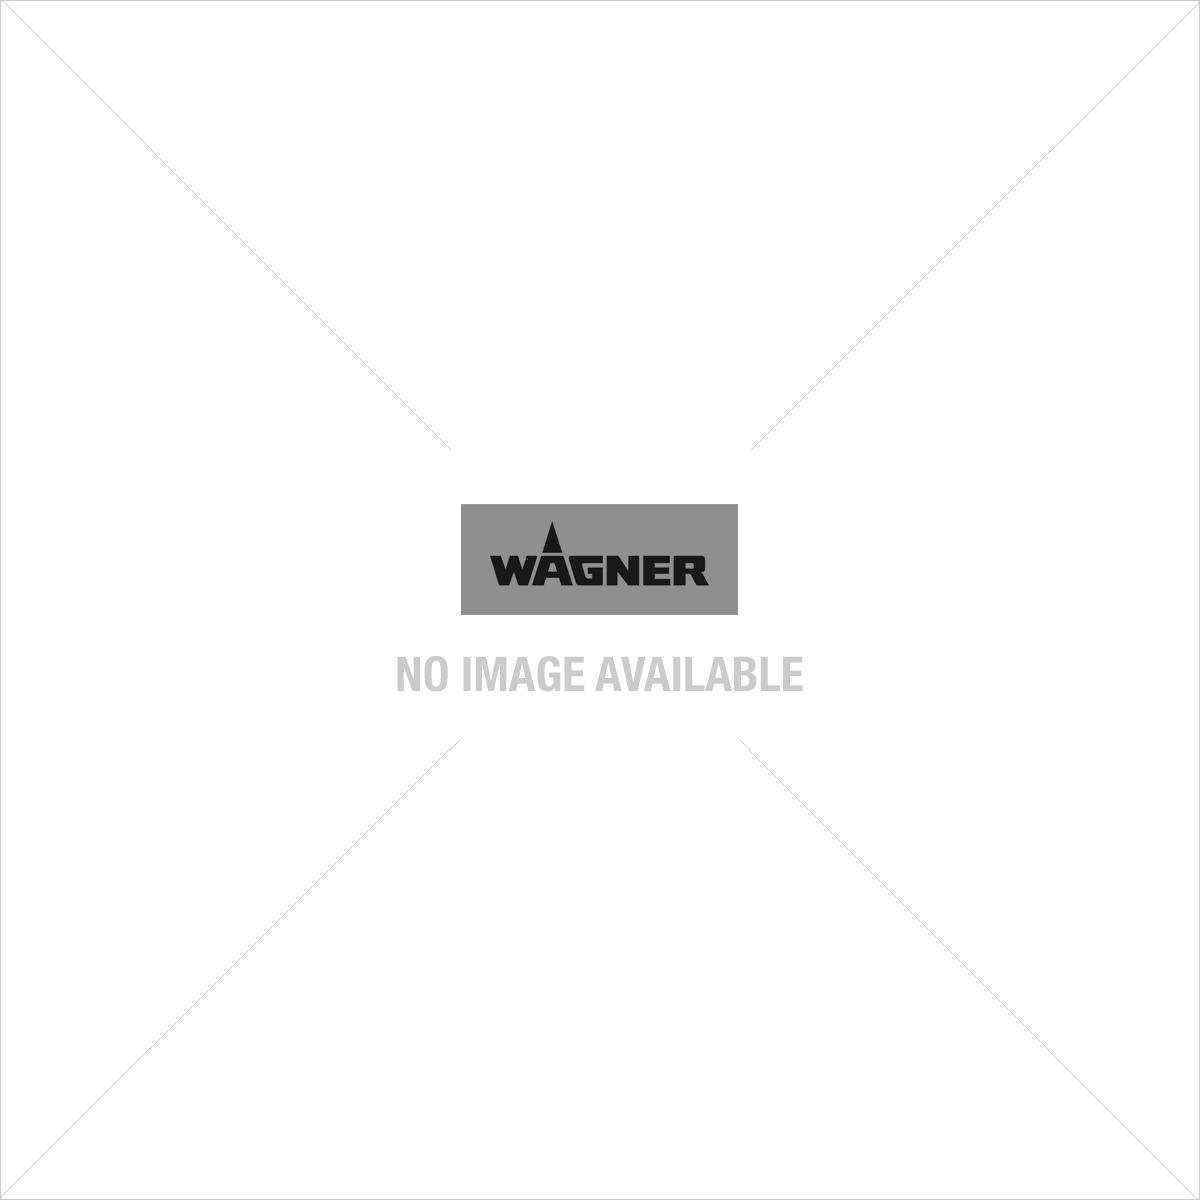 Cover front, yellow, W 990 Flexio